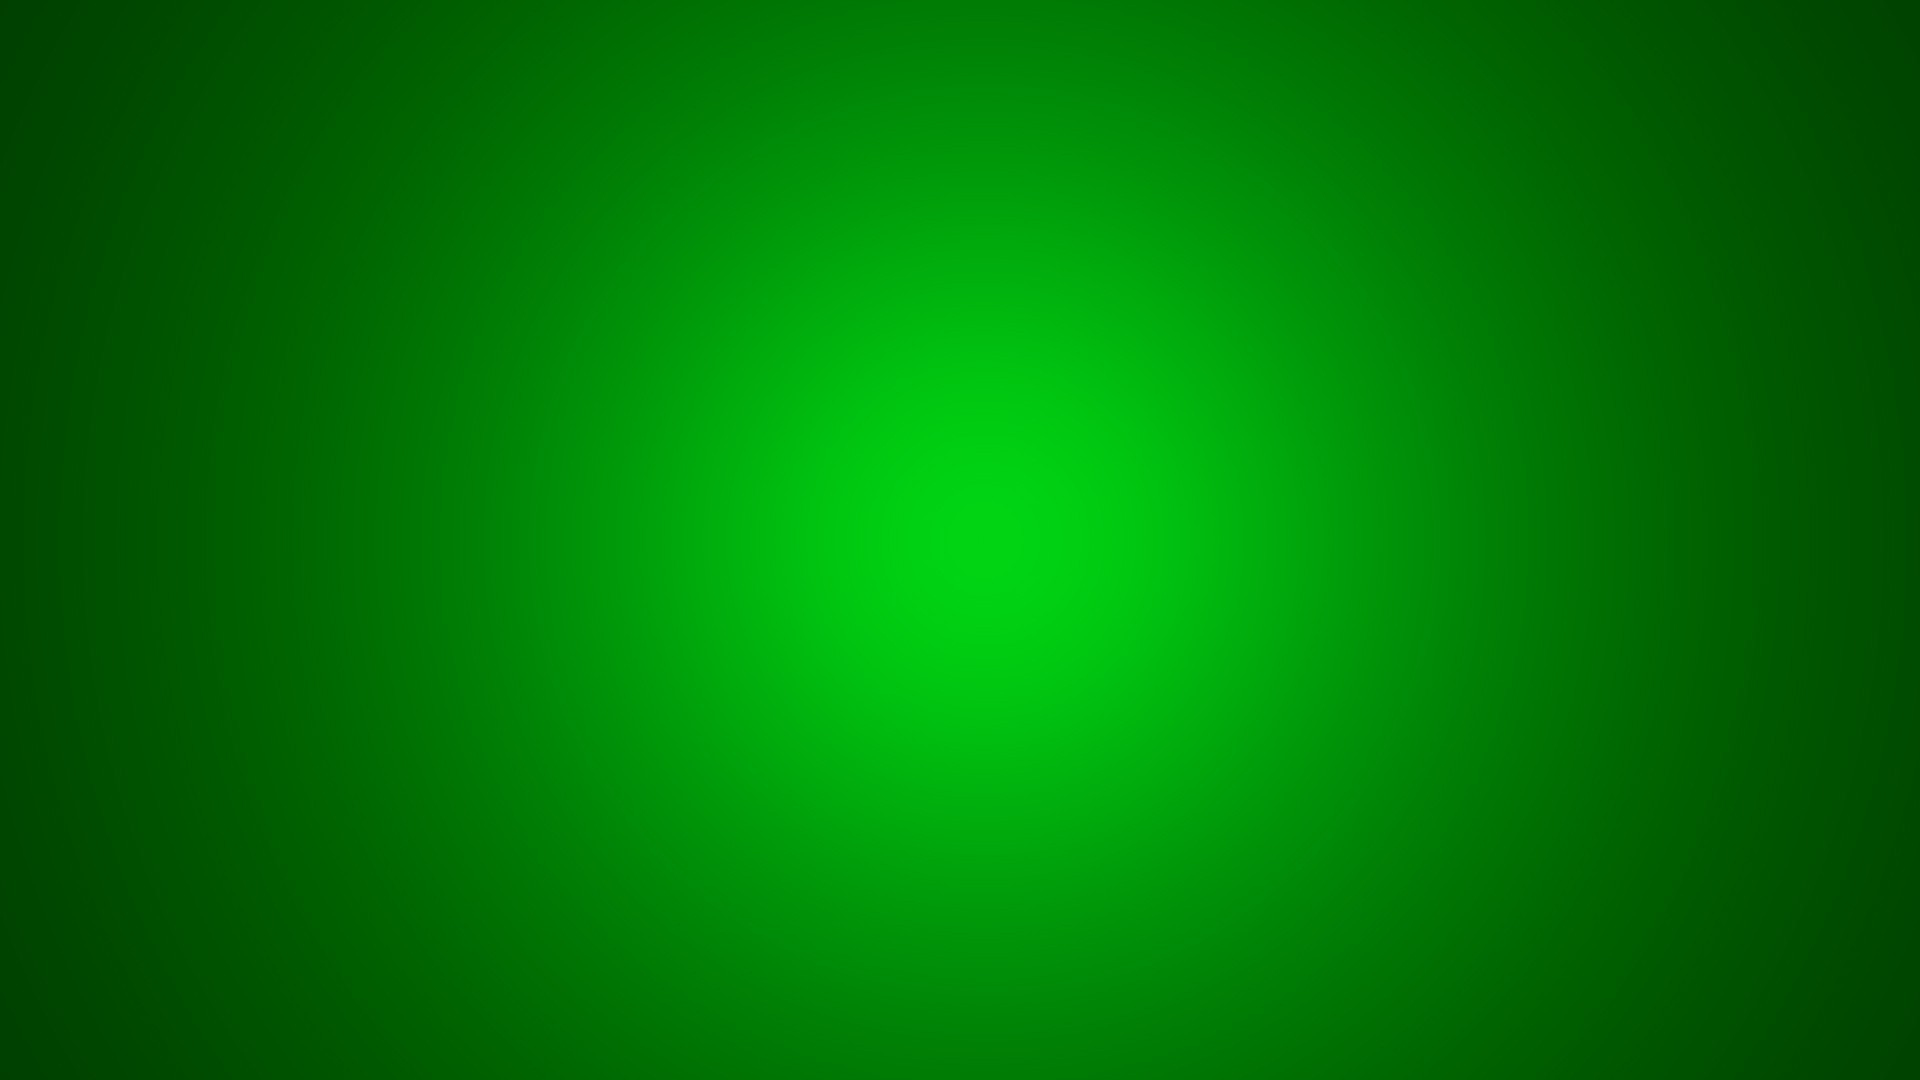 Free House Layout Plain Green Background Wallpaper 3 Sirona Therapeutic